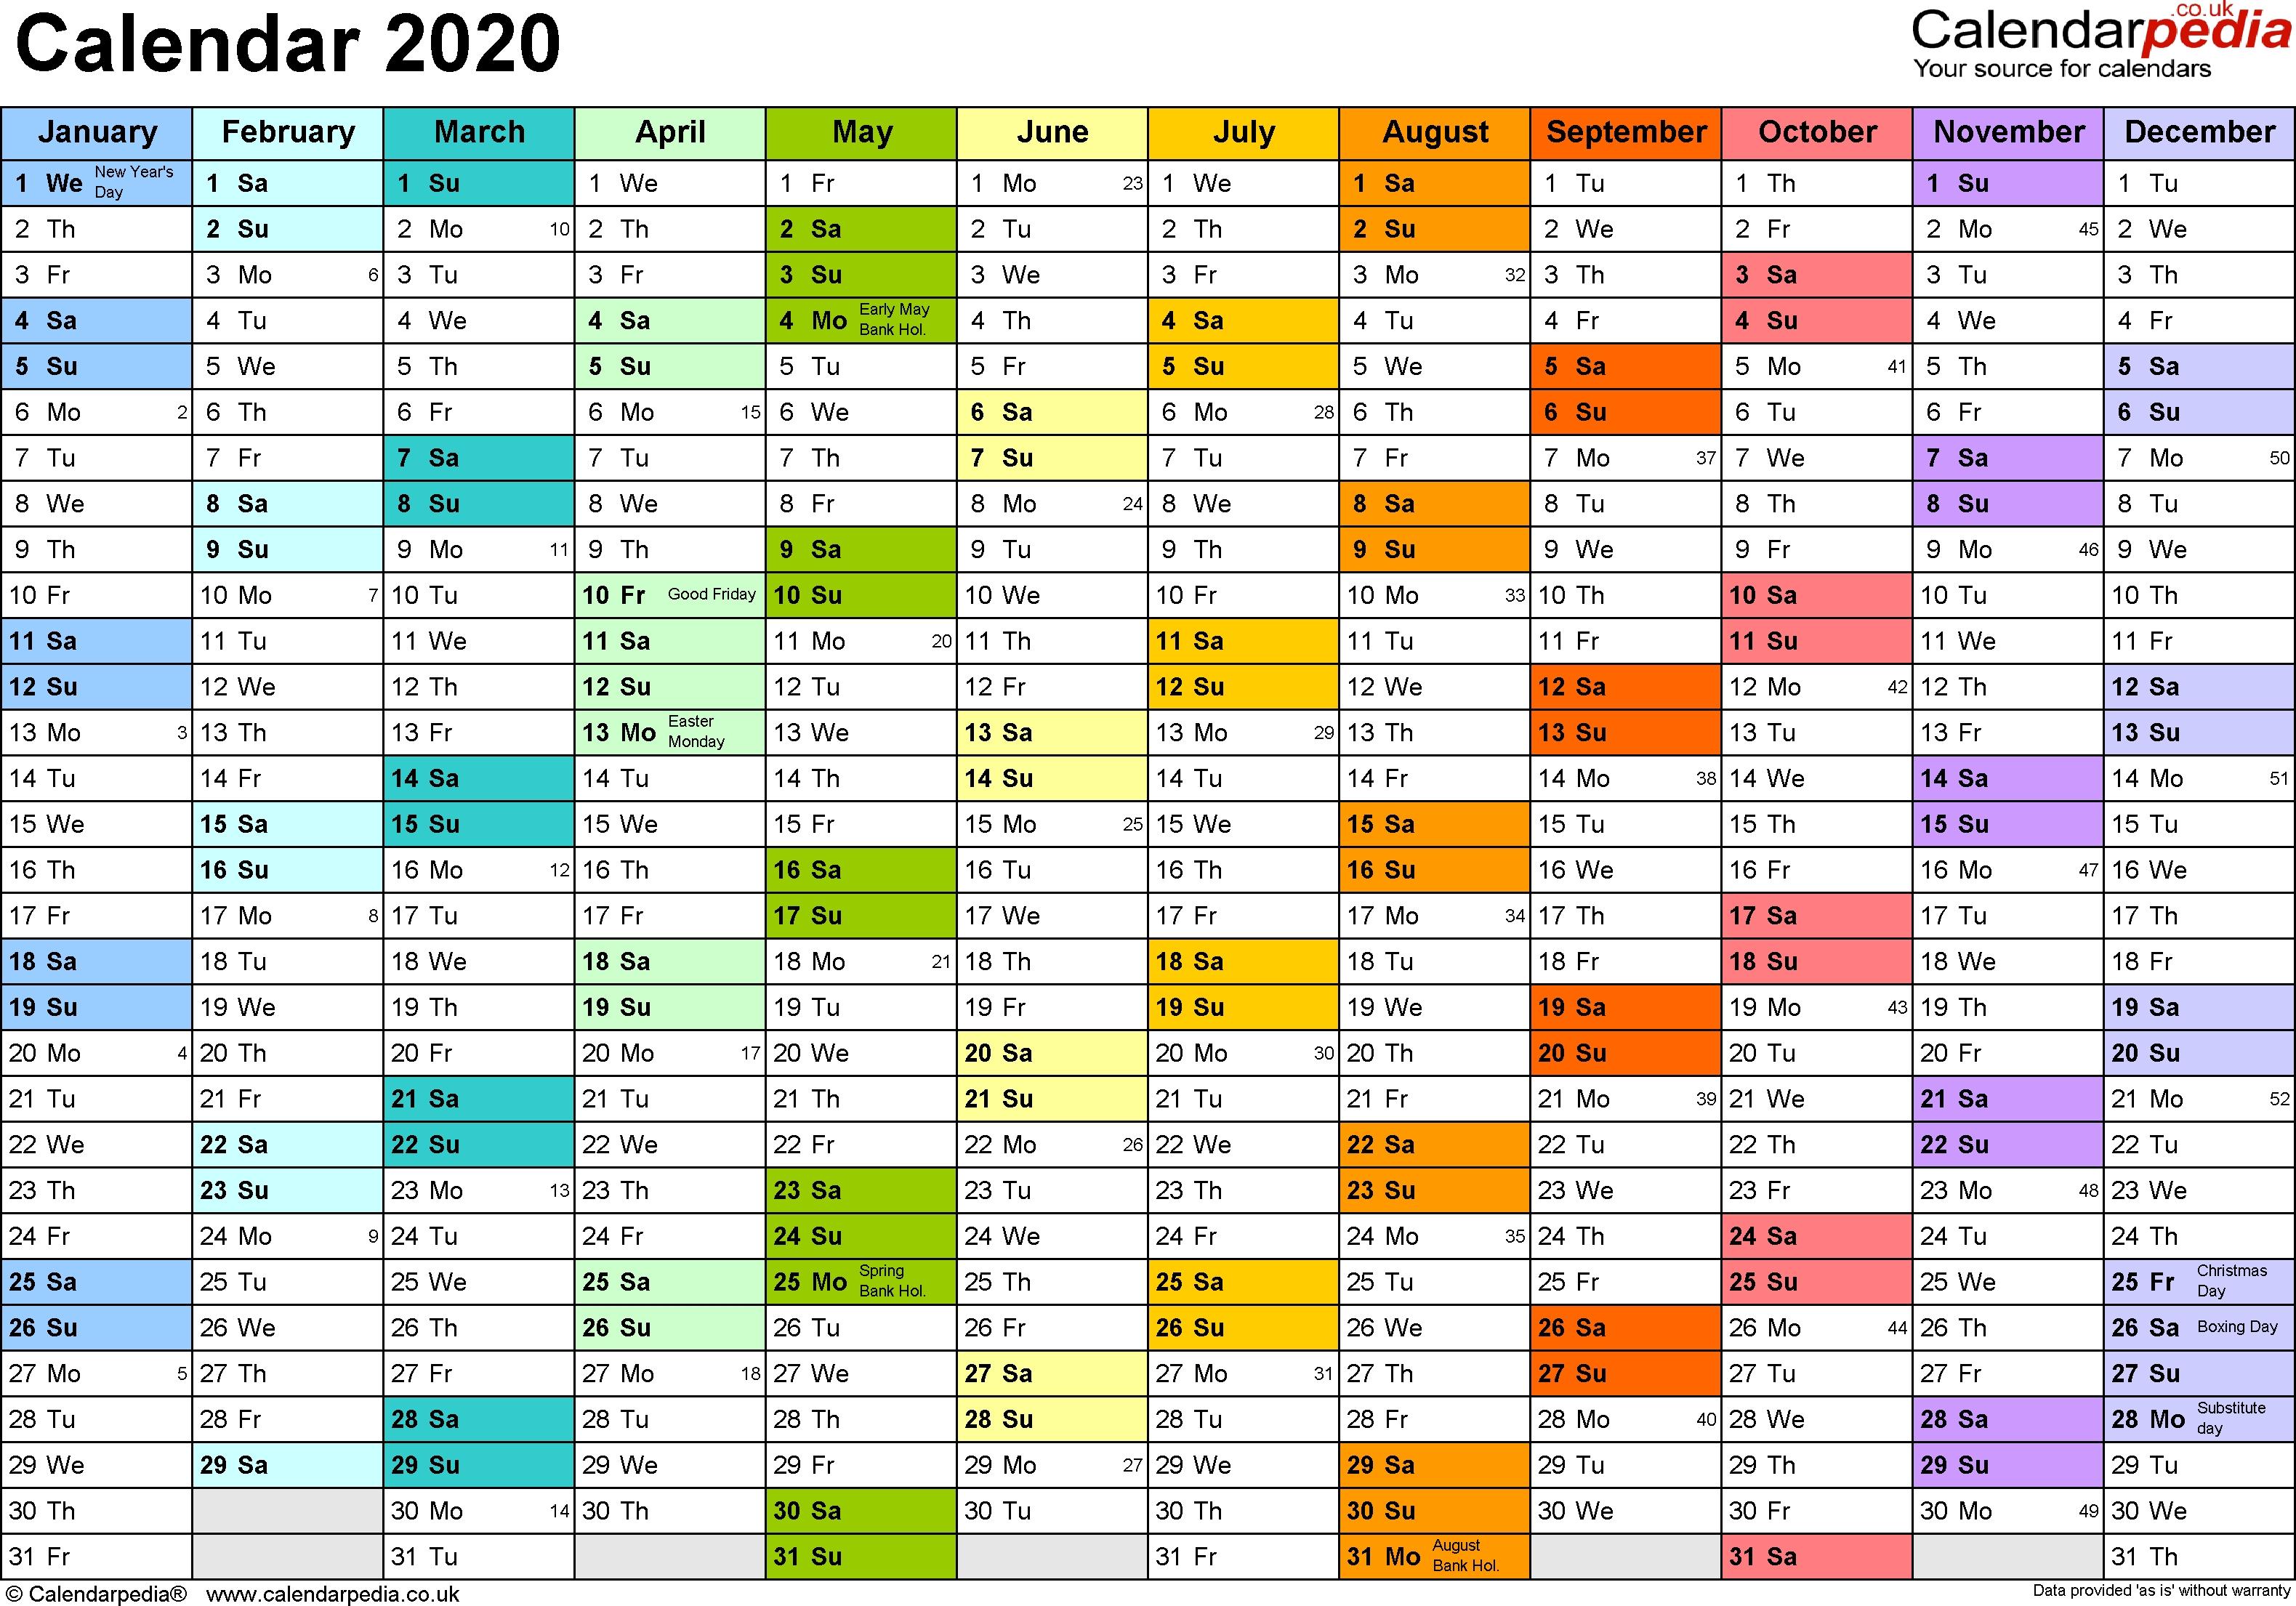 Calendar 2020 (Uk) - 16 Free Printable Pdf Templates 2020 Calendar Uk With Week Numbers